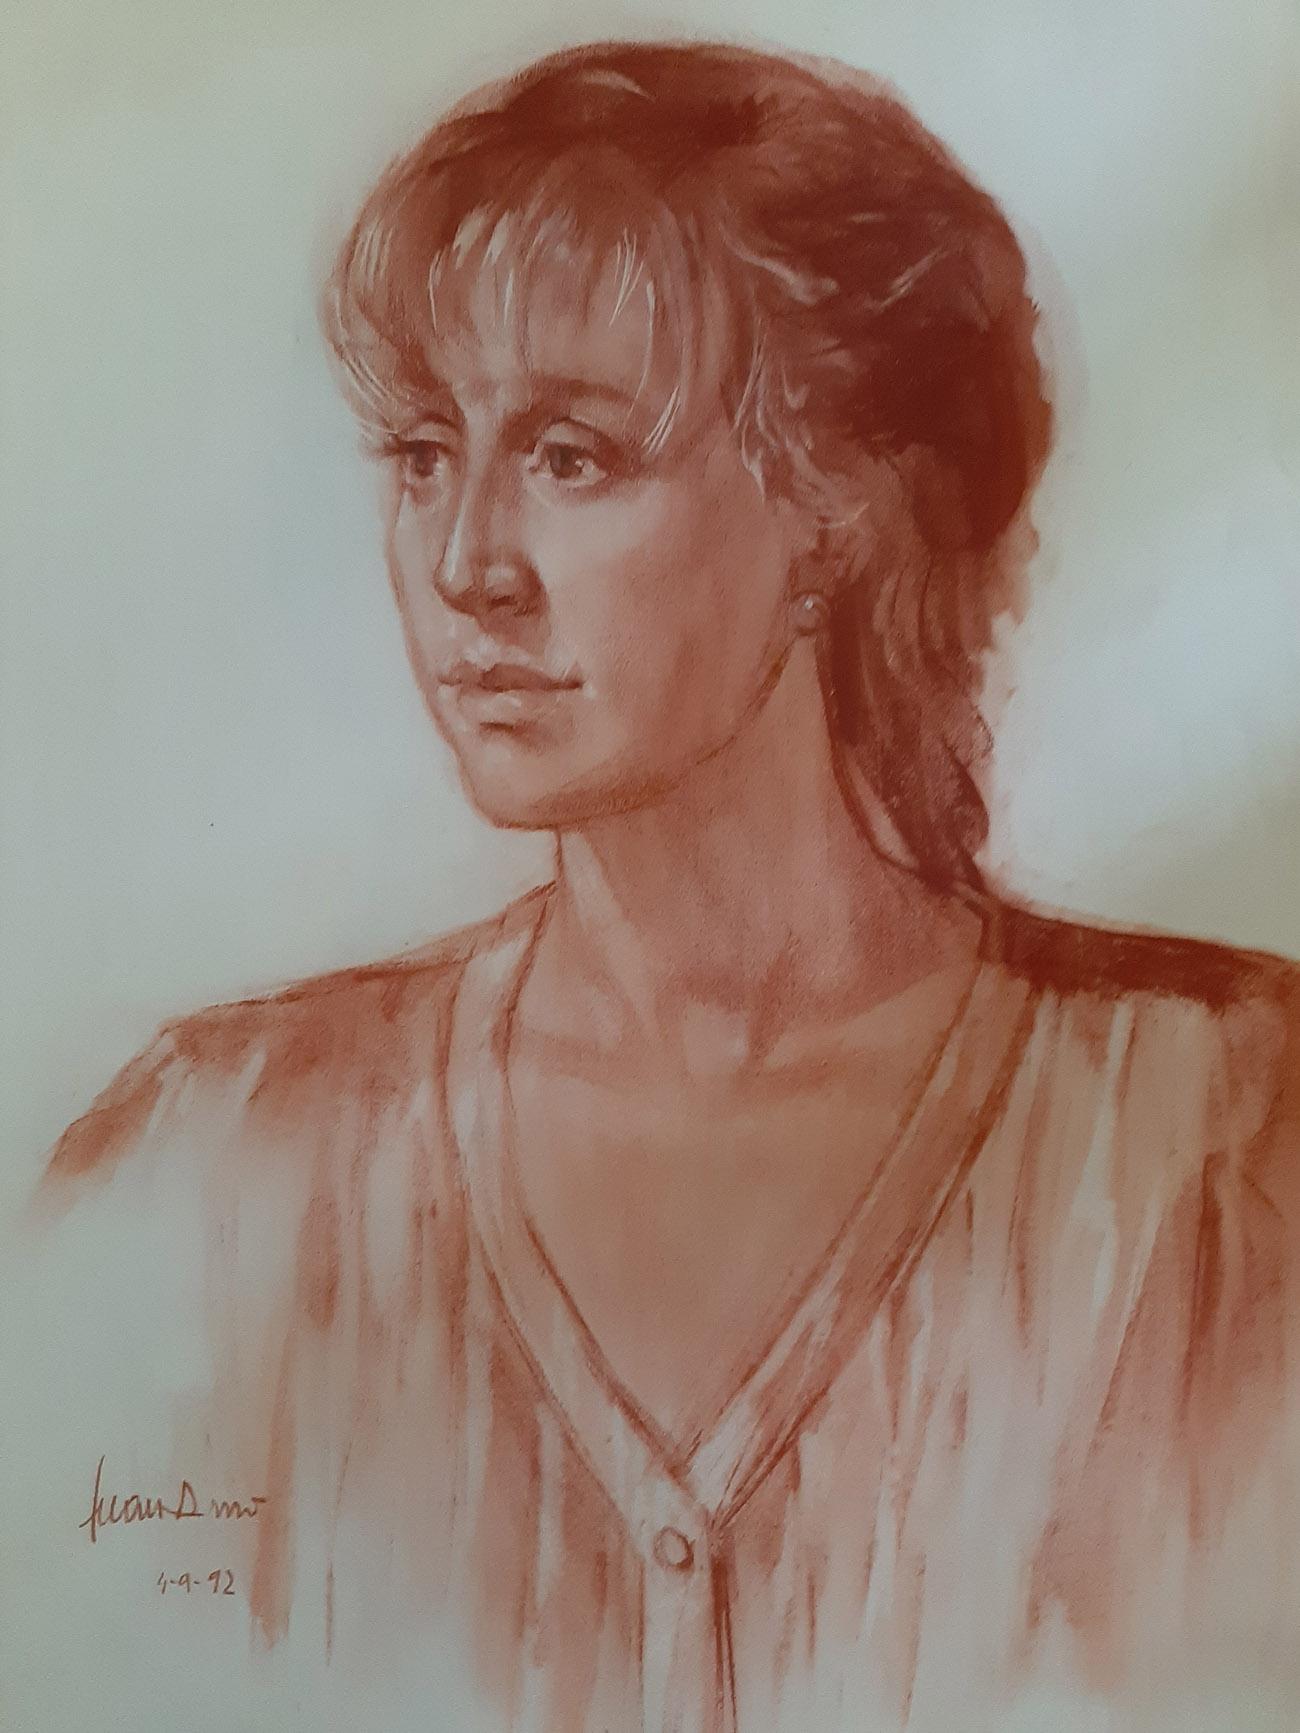 MARÍA AMO SAUS. Retrato Dibujo de Juan Amo.